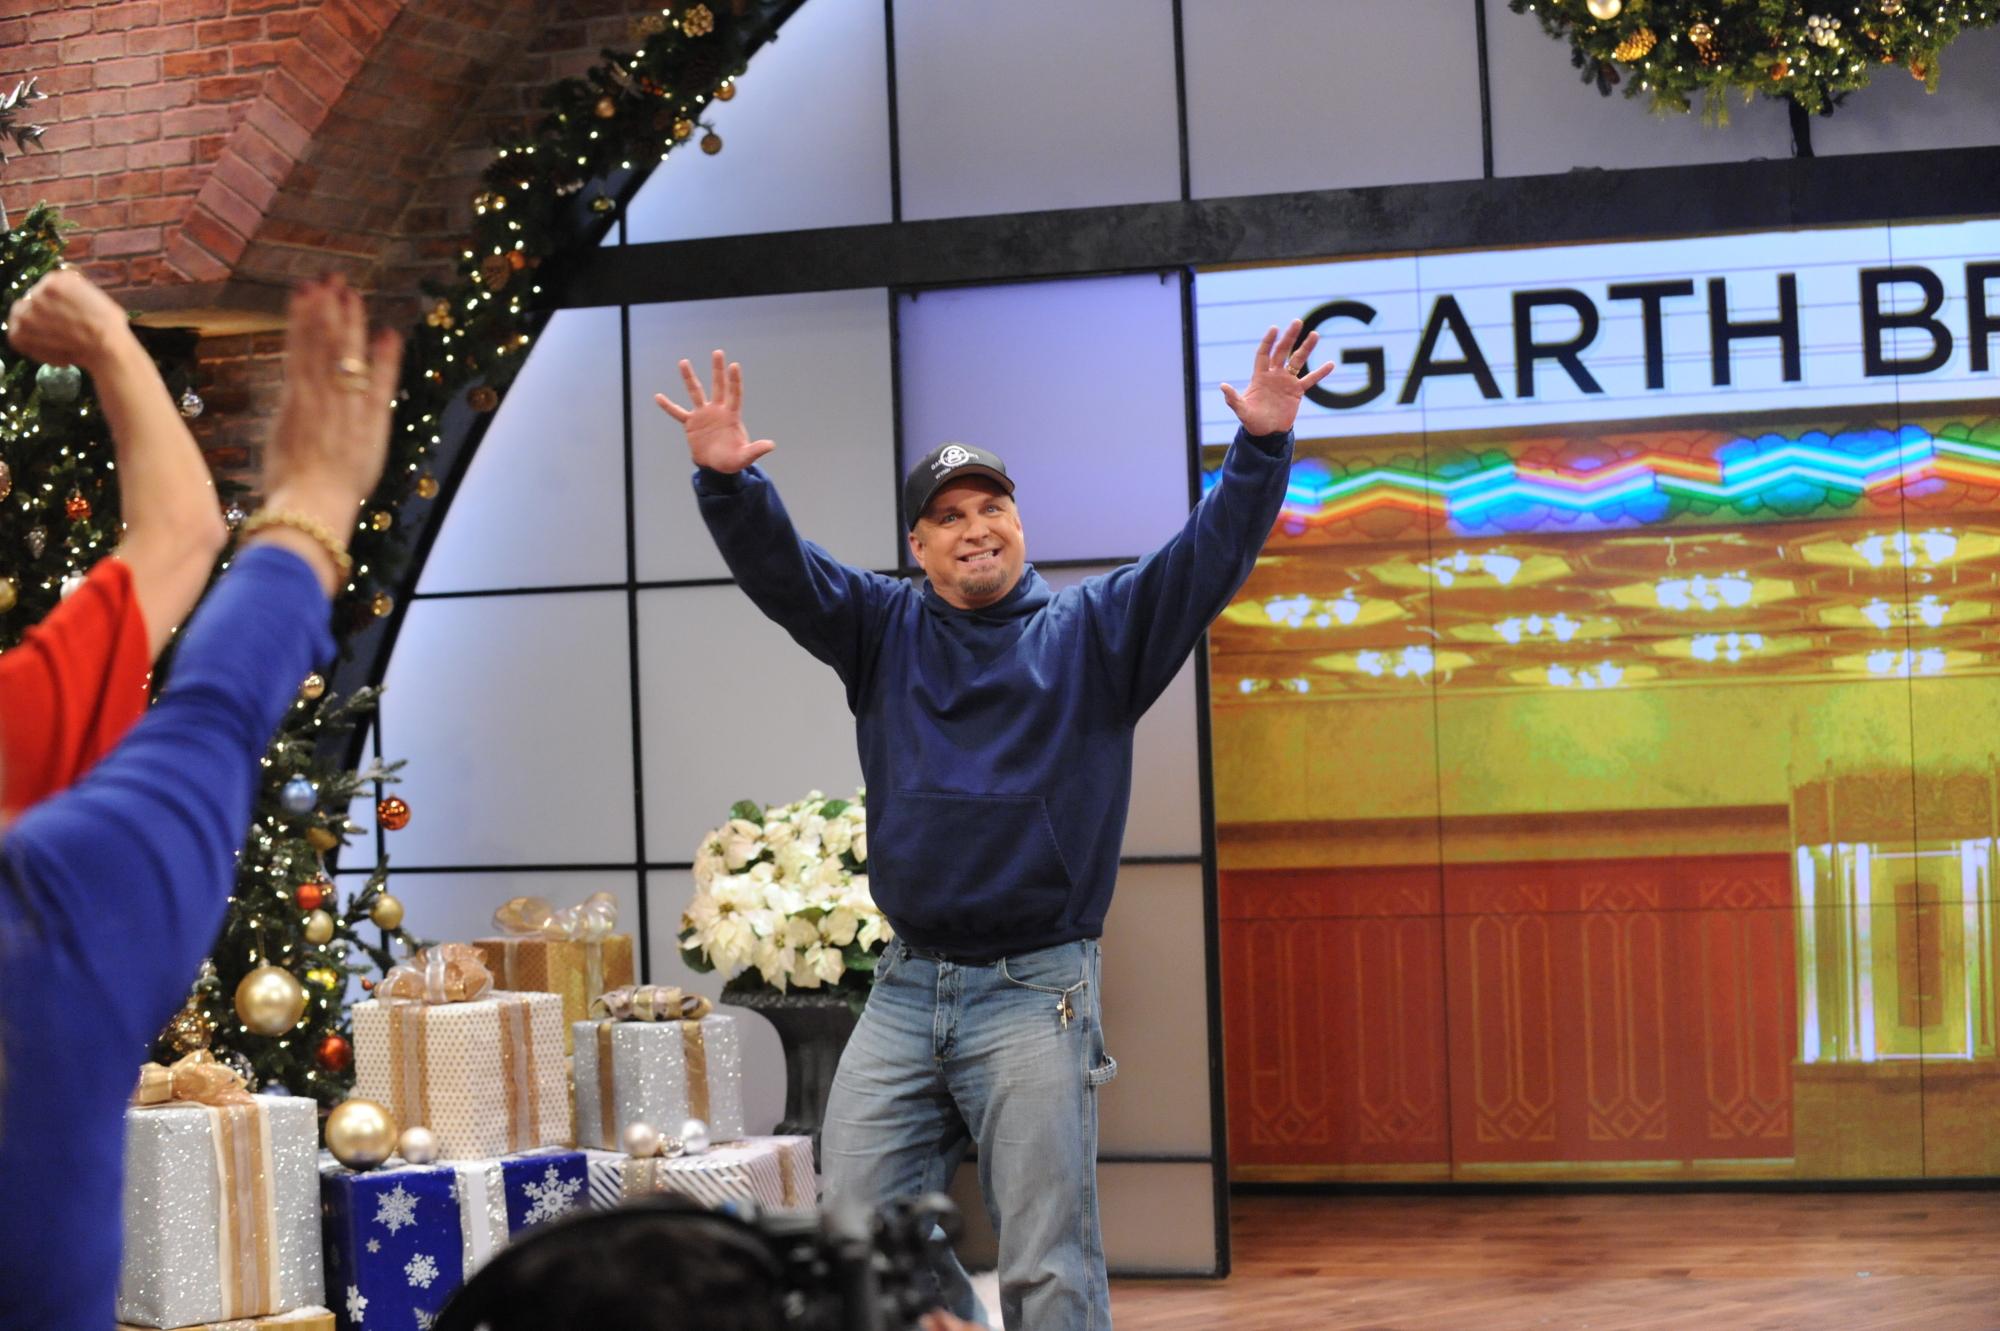 20. Garth Brooks - Country Music Singer/Songwriter